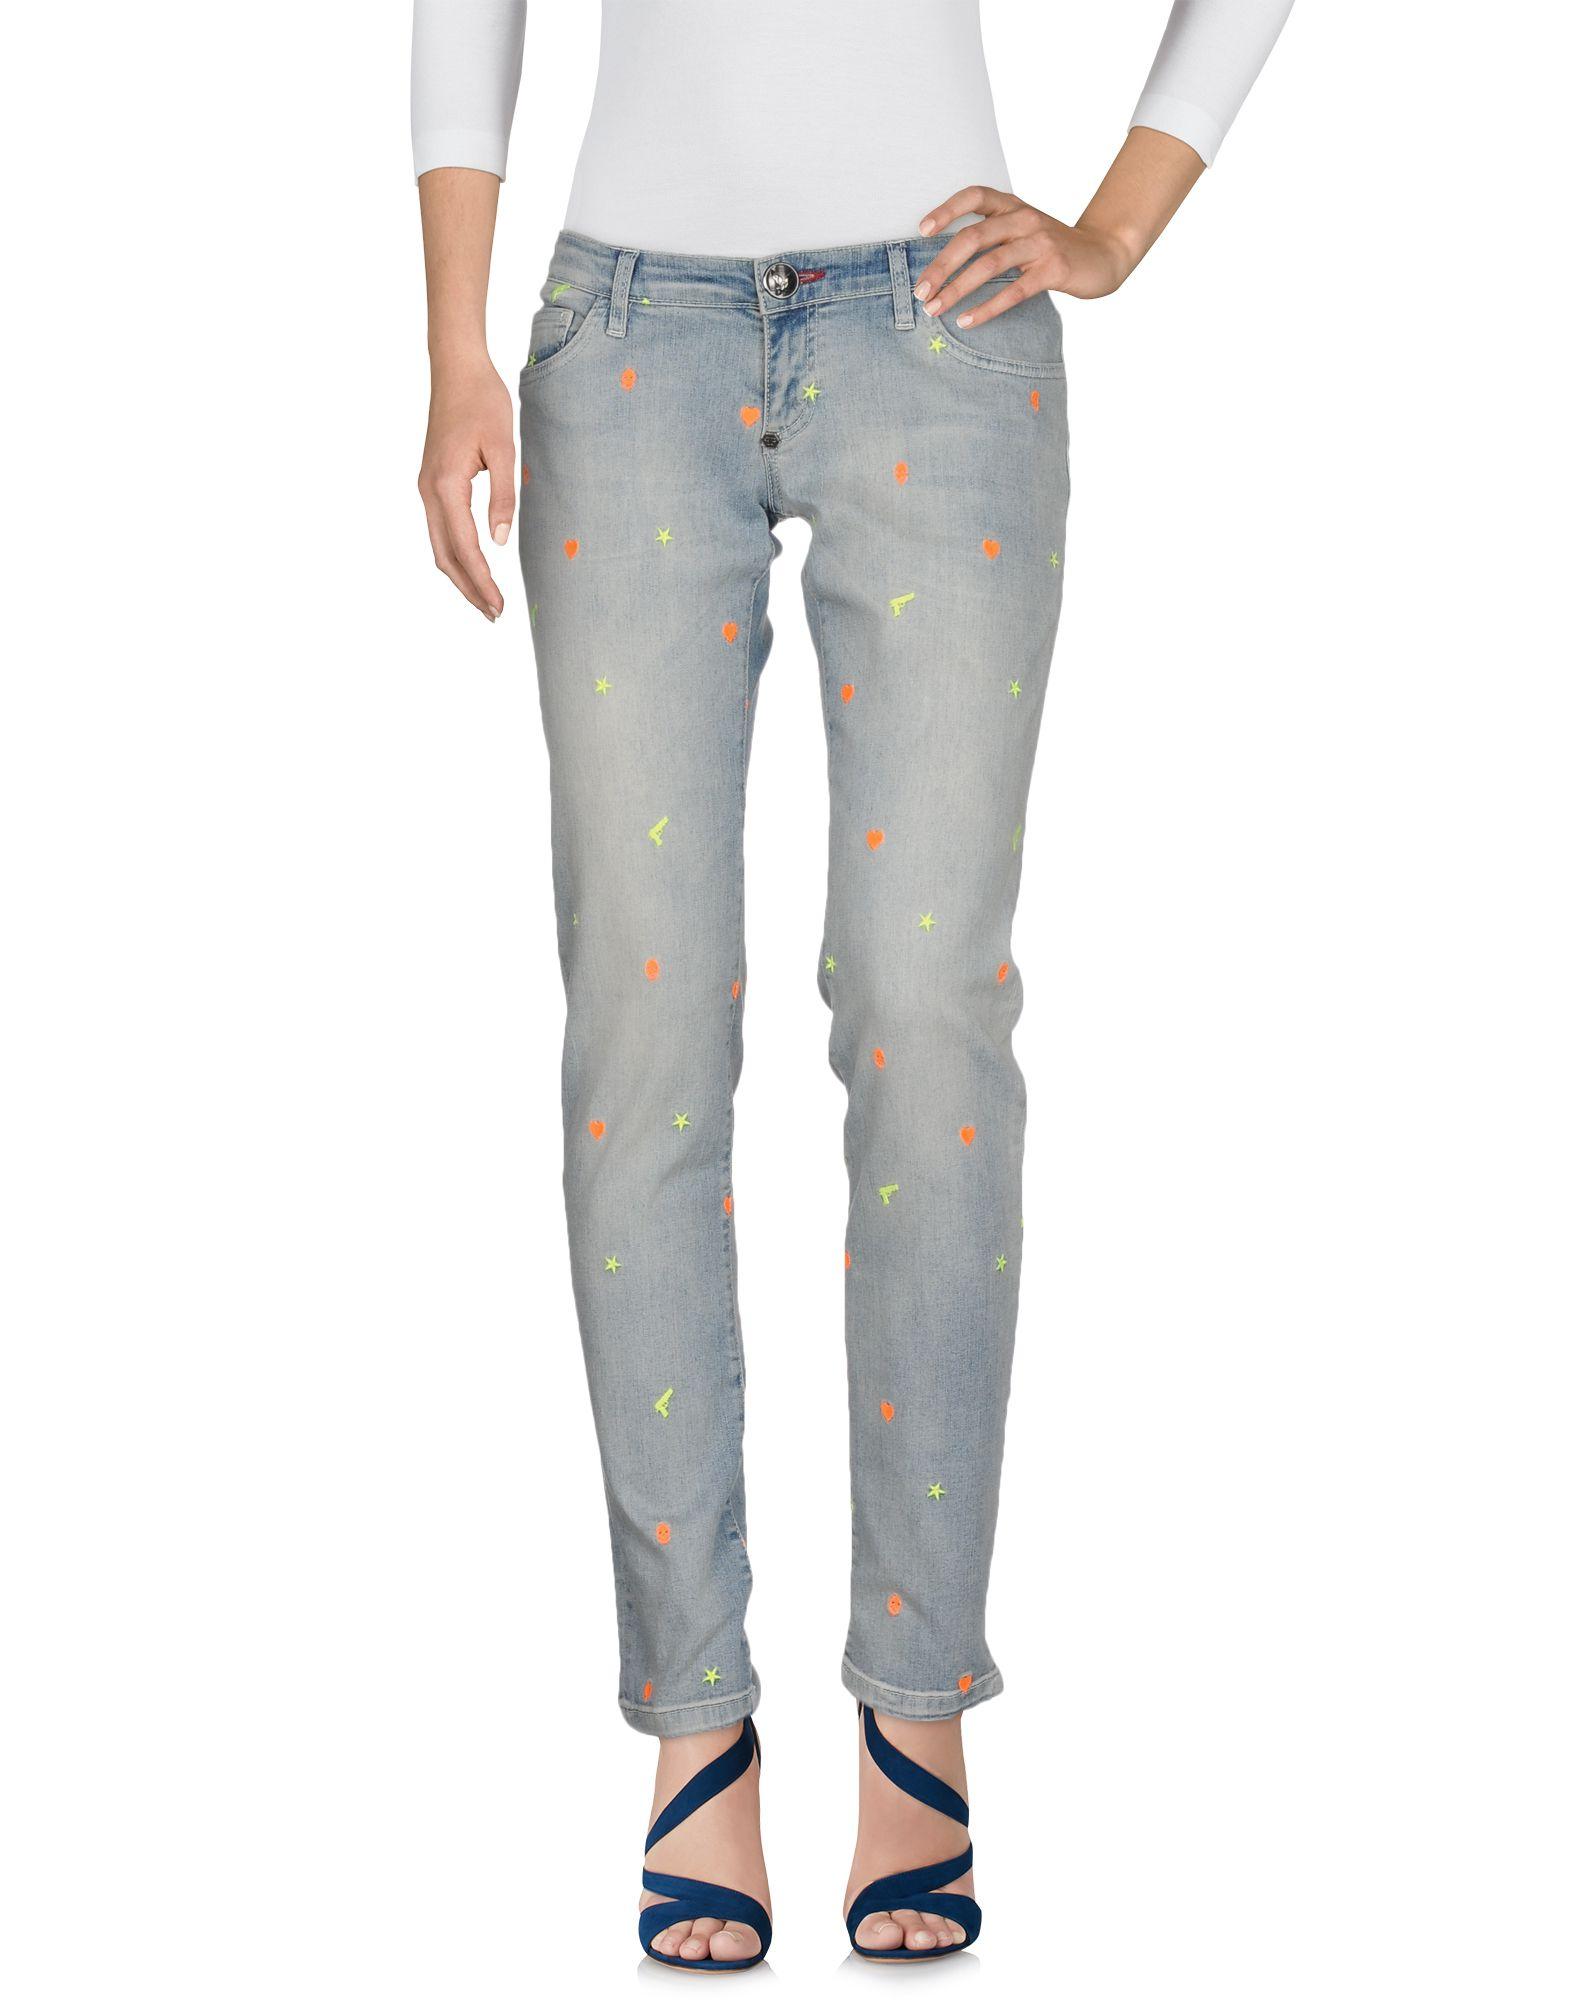 Pantaloni Jeans Philipp Plein Donna - Acquista online su HJSYvk